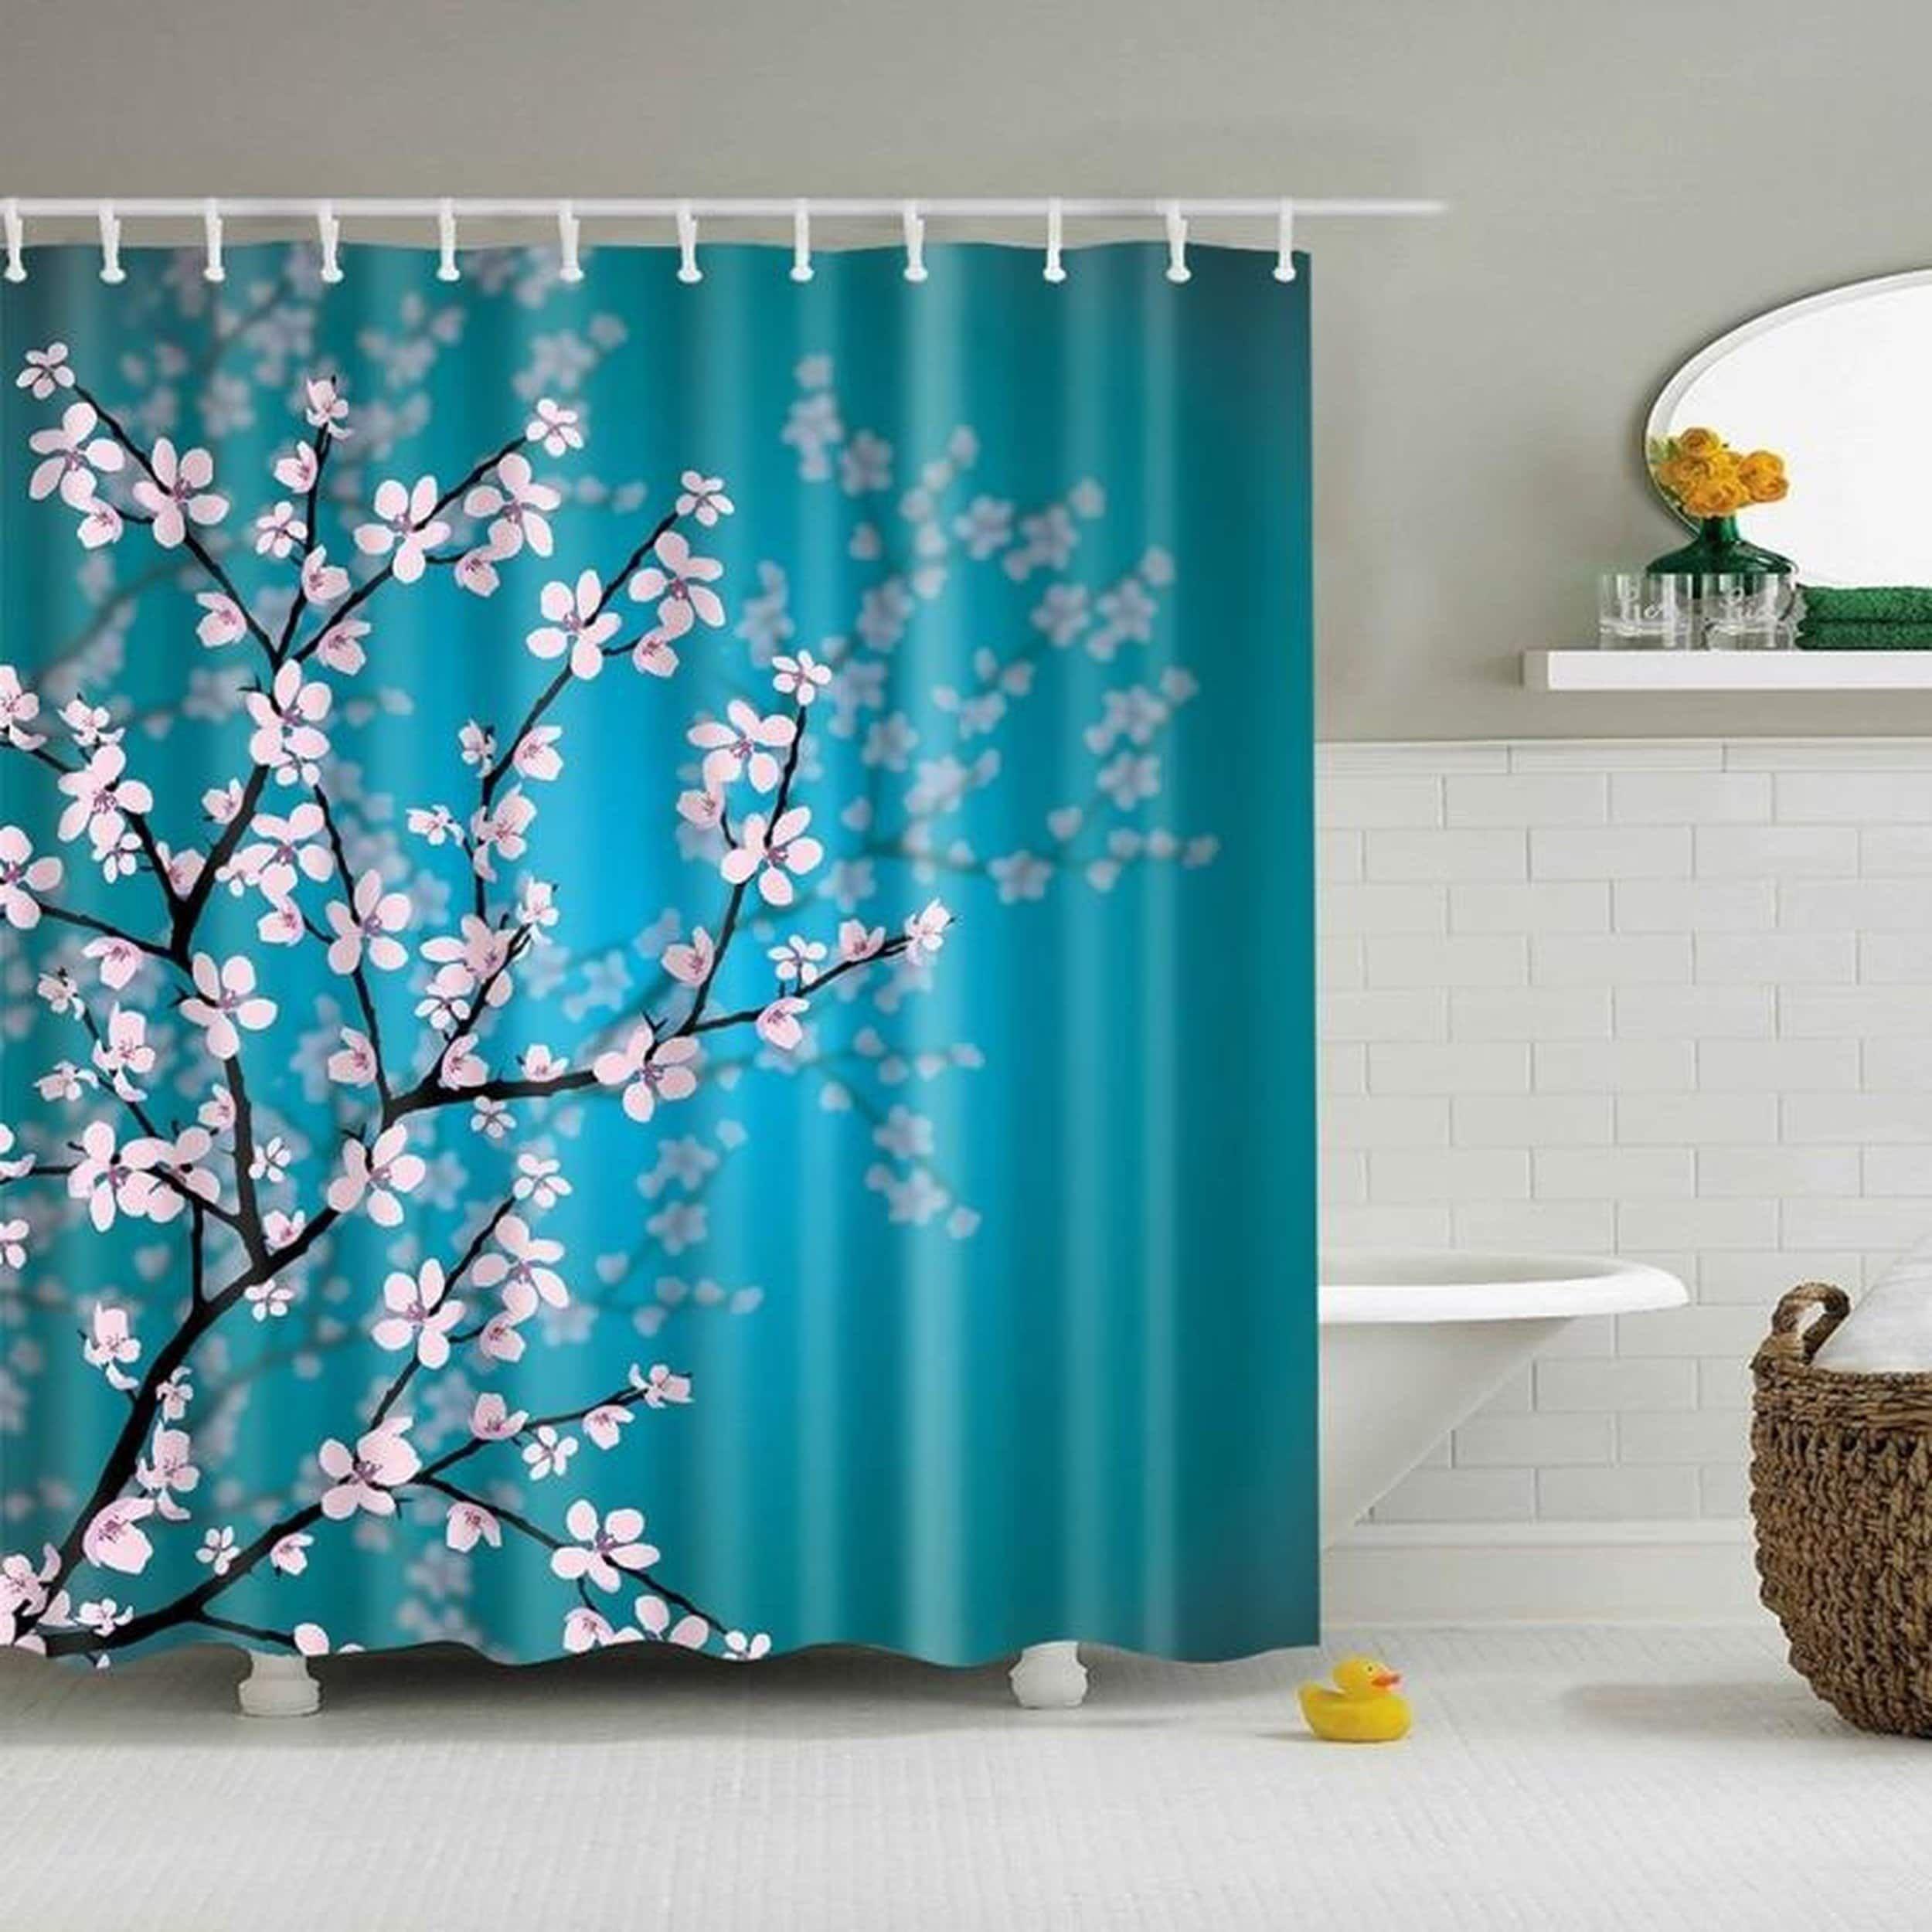 Colorful Summer Llama Bathroom Fabric Shower Curtain Liner Waterproof 12 Hooks